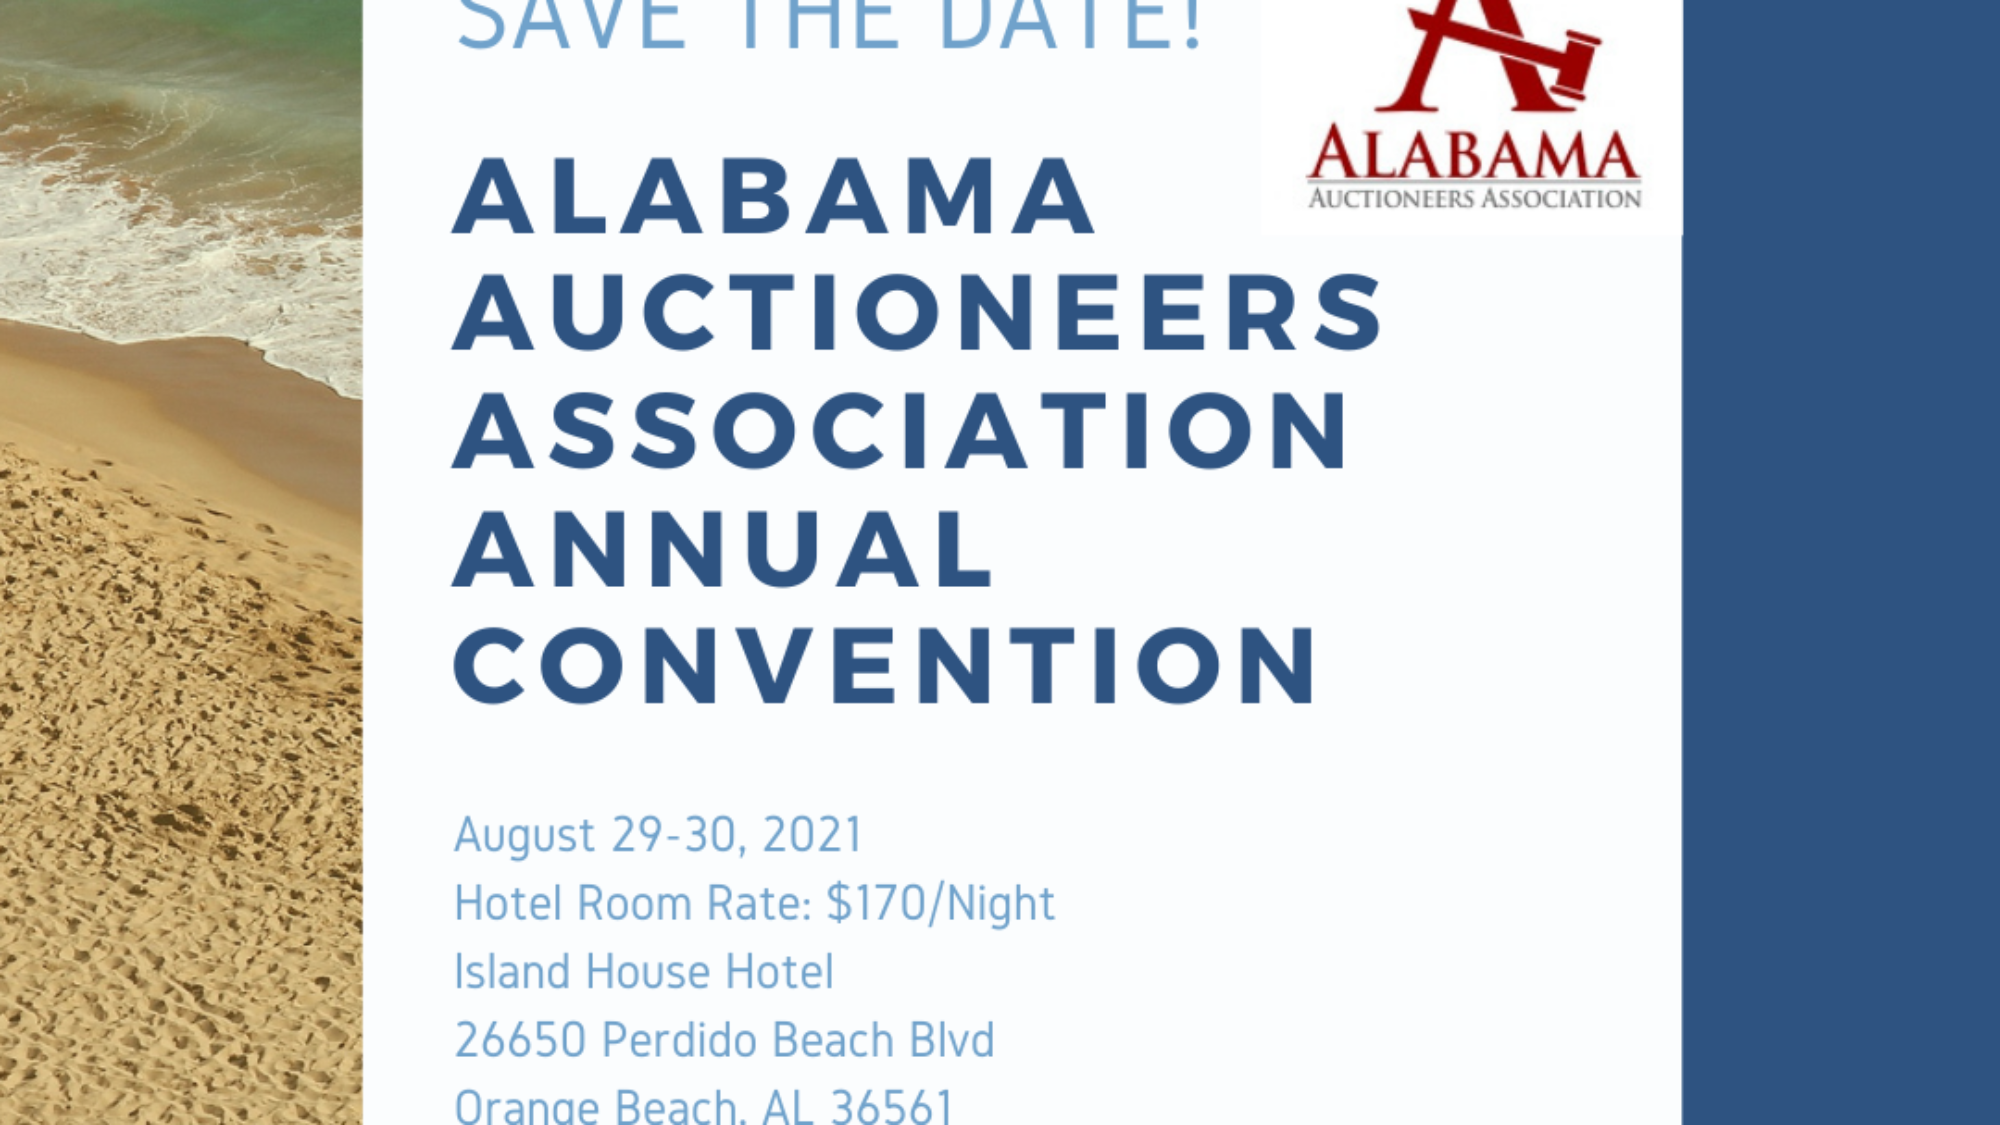 Alabama Save the date 2021